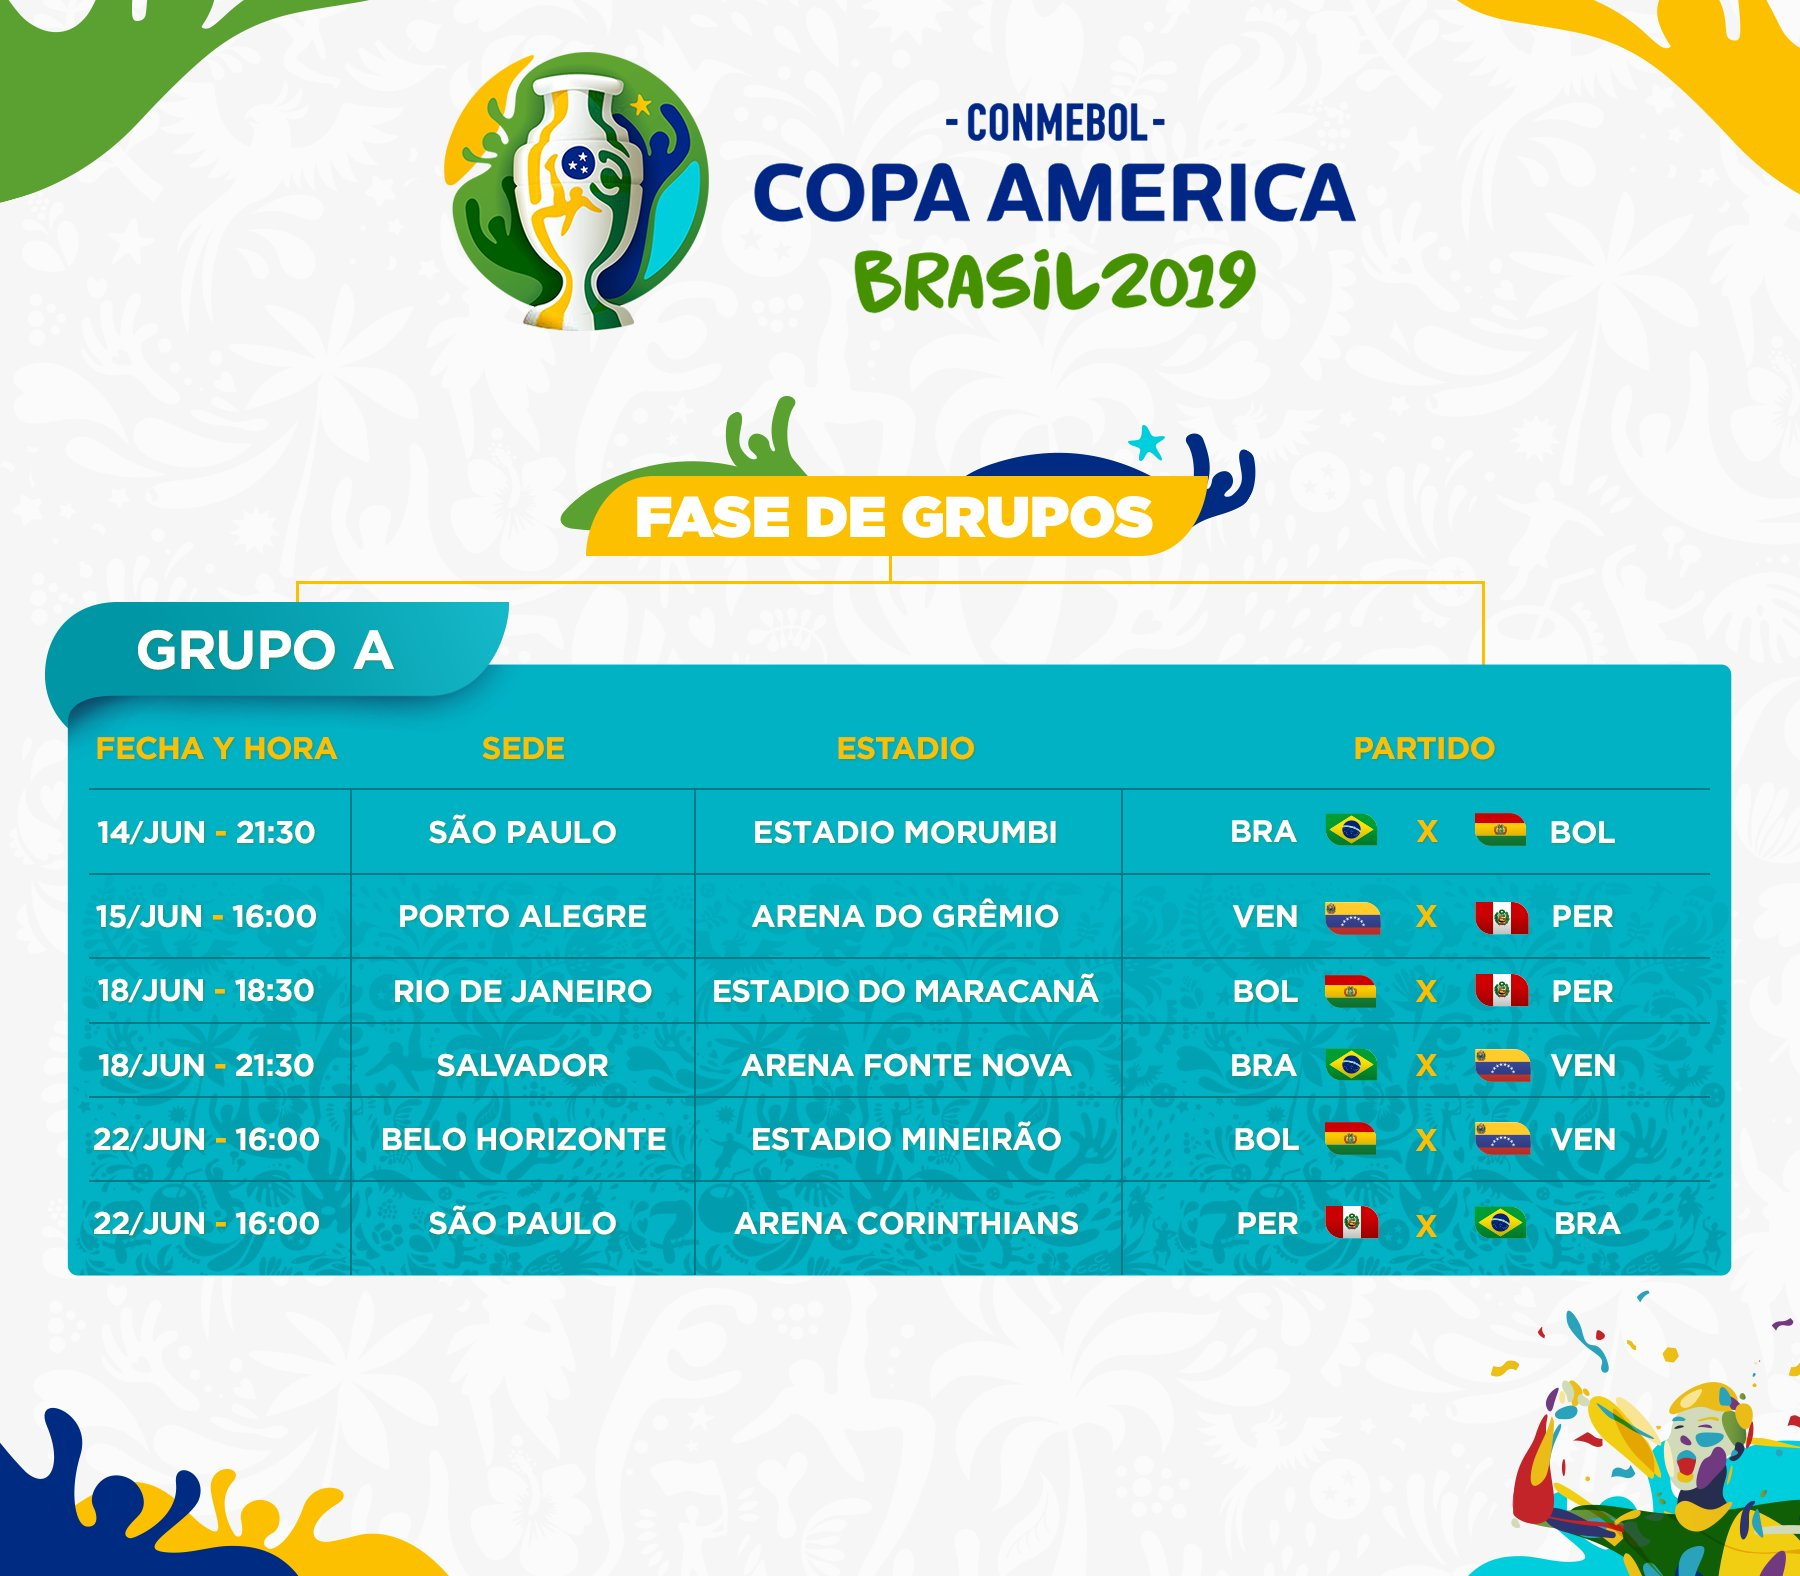 Copa America Calendrier.Copa America 2019 Tirage Et Calendrier